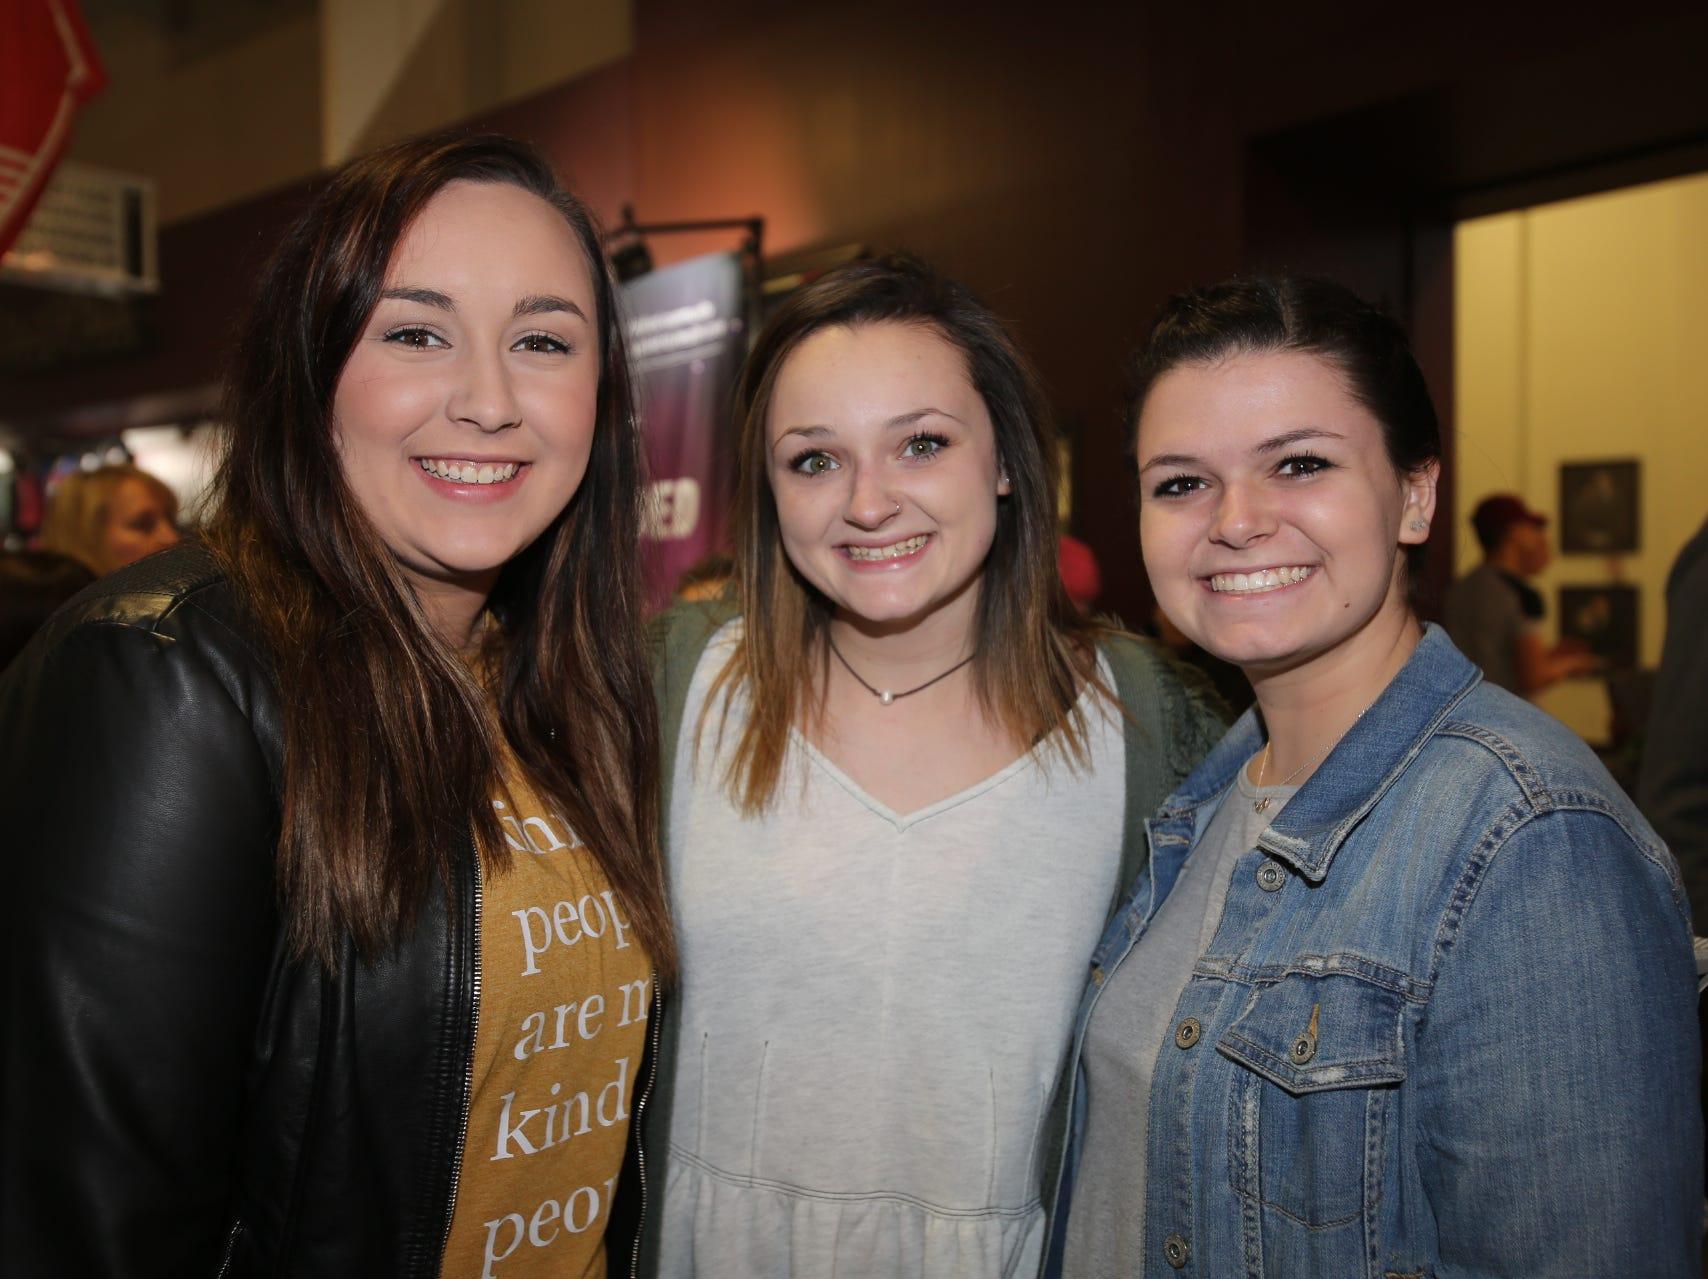 Cat Kristek, Riley, and Jennifer Kocevar